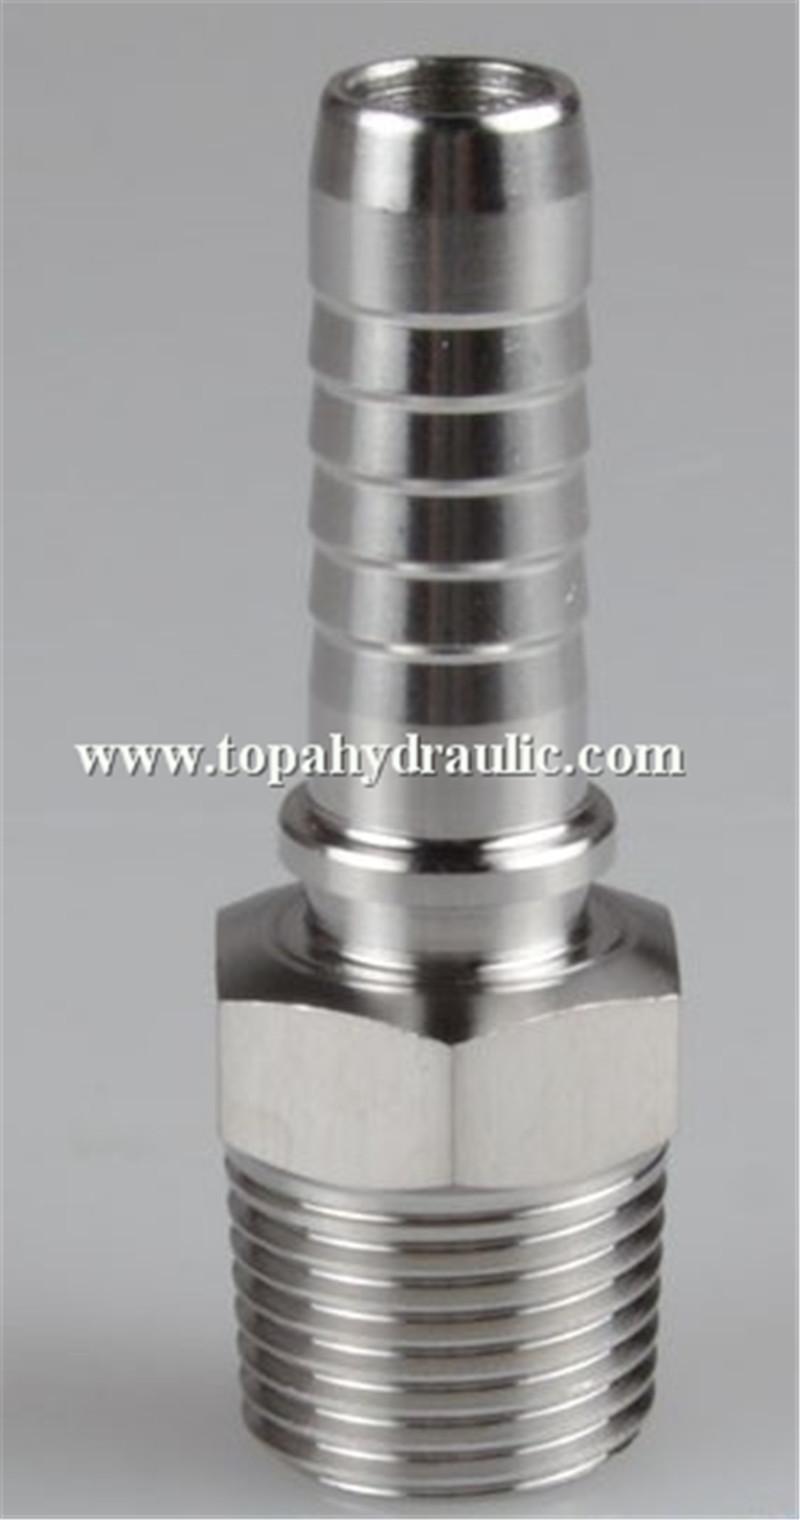 12611 Hose crimp BSP reusable hydraulic swivel fittings